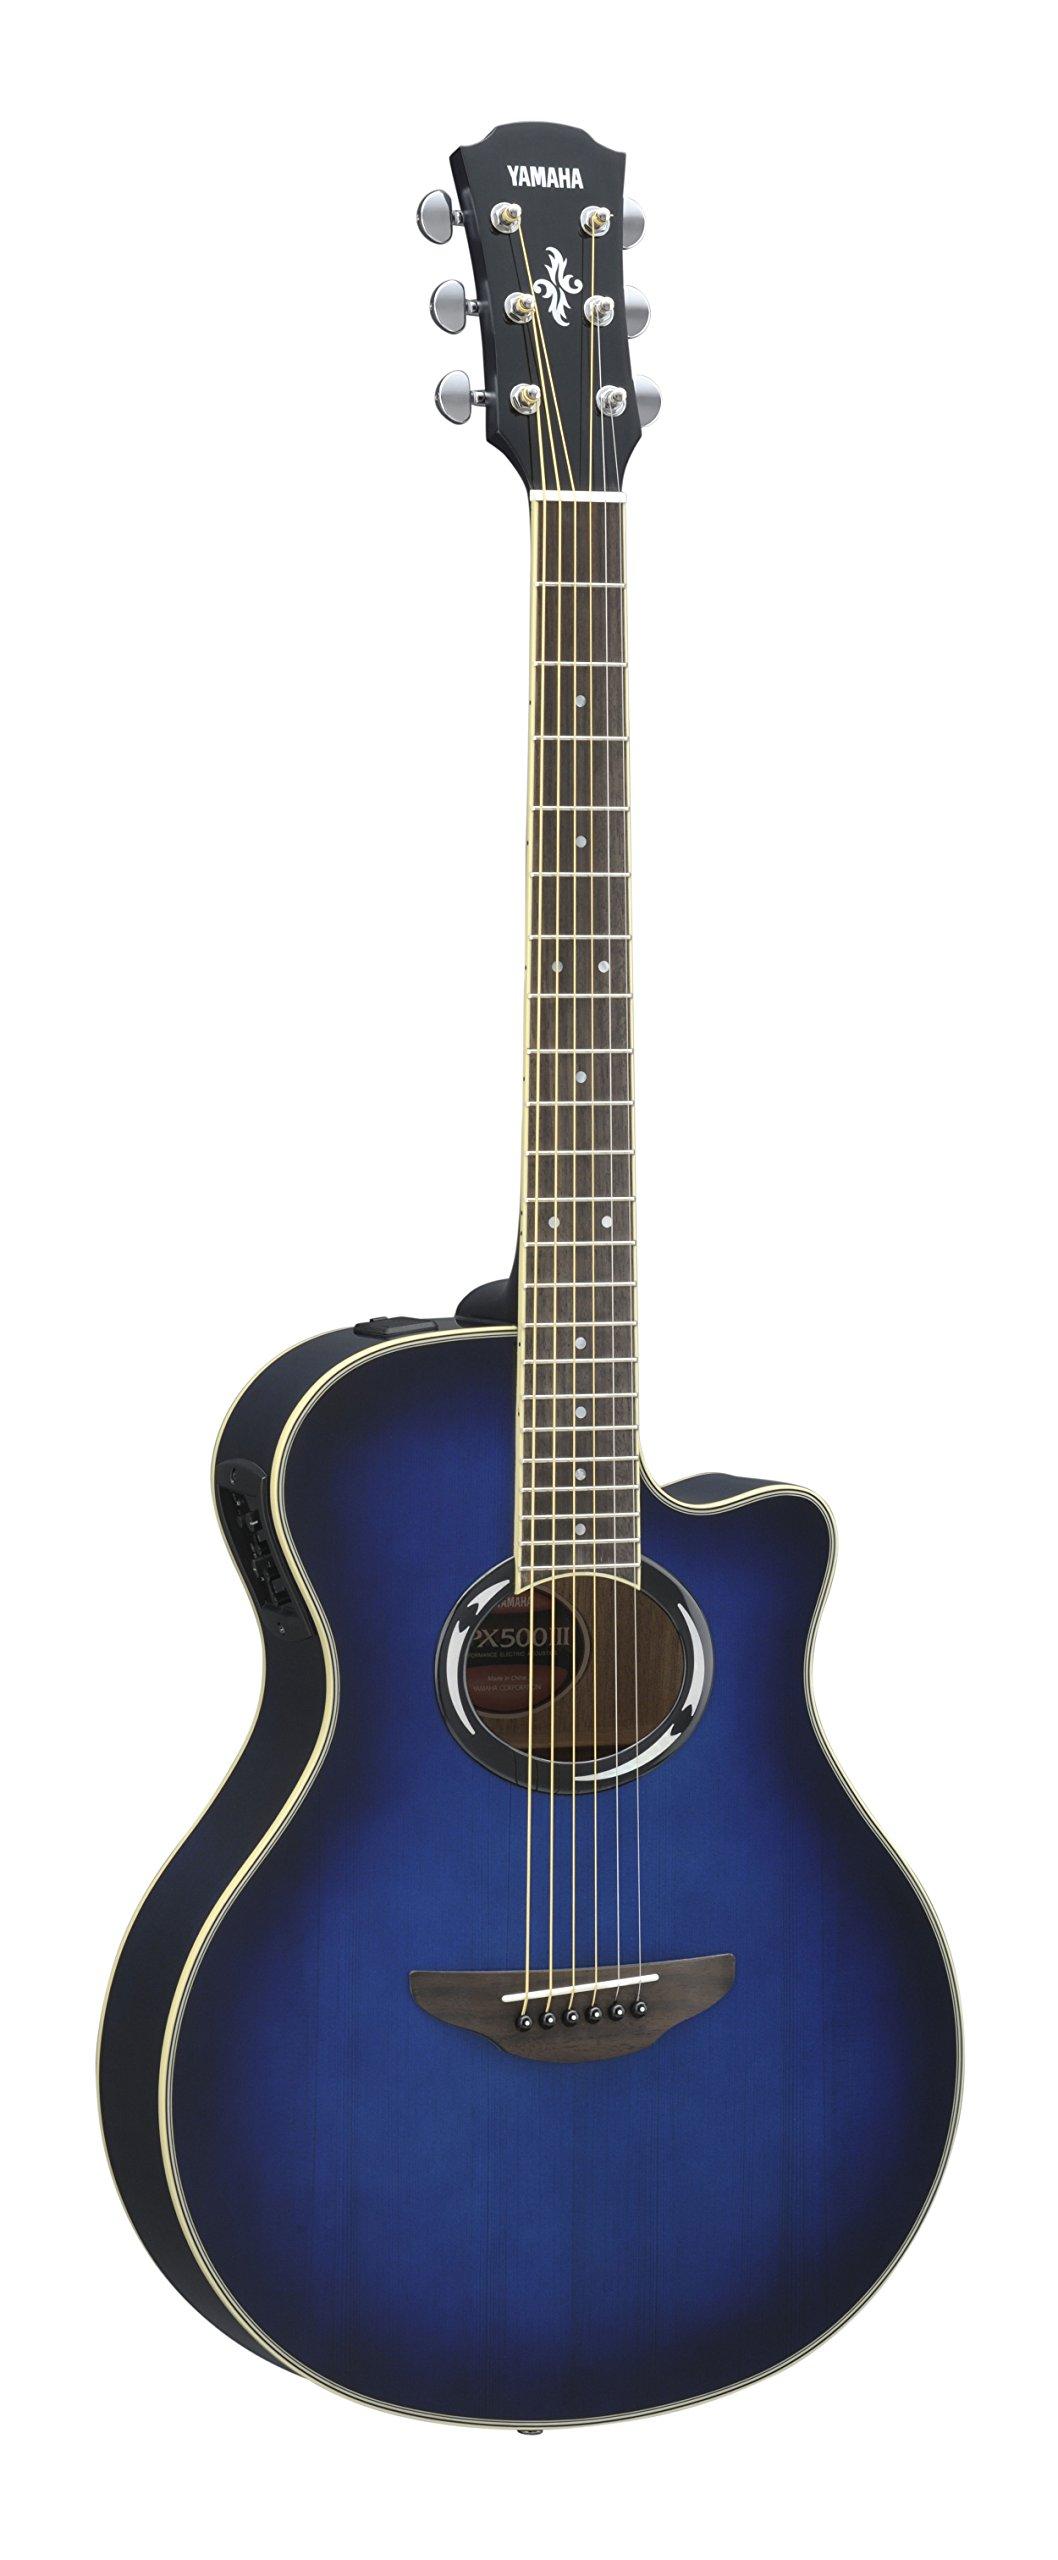 Yamaha APX500III Thinline Cutaway Acoustic-Electric Guitar, Oriental Blue Burst